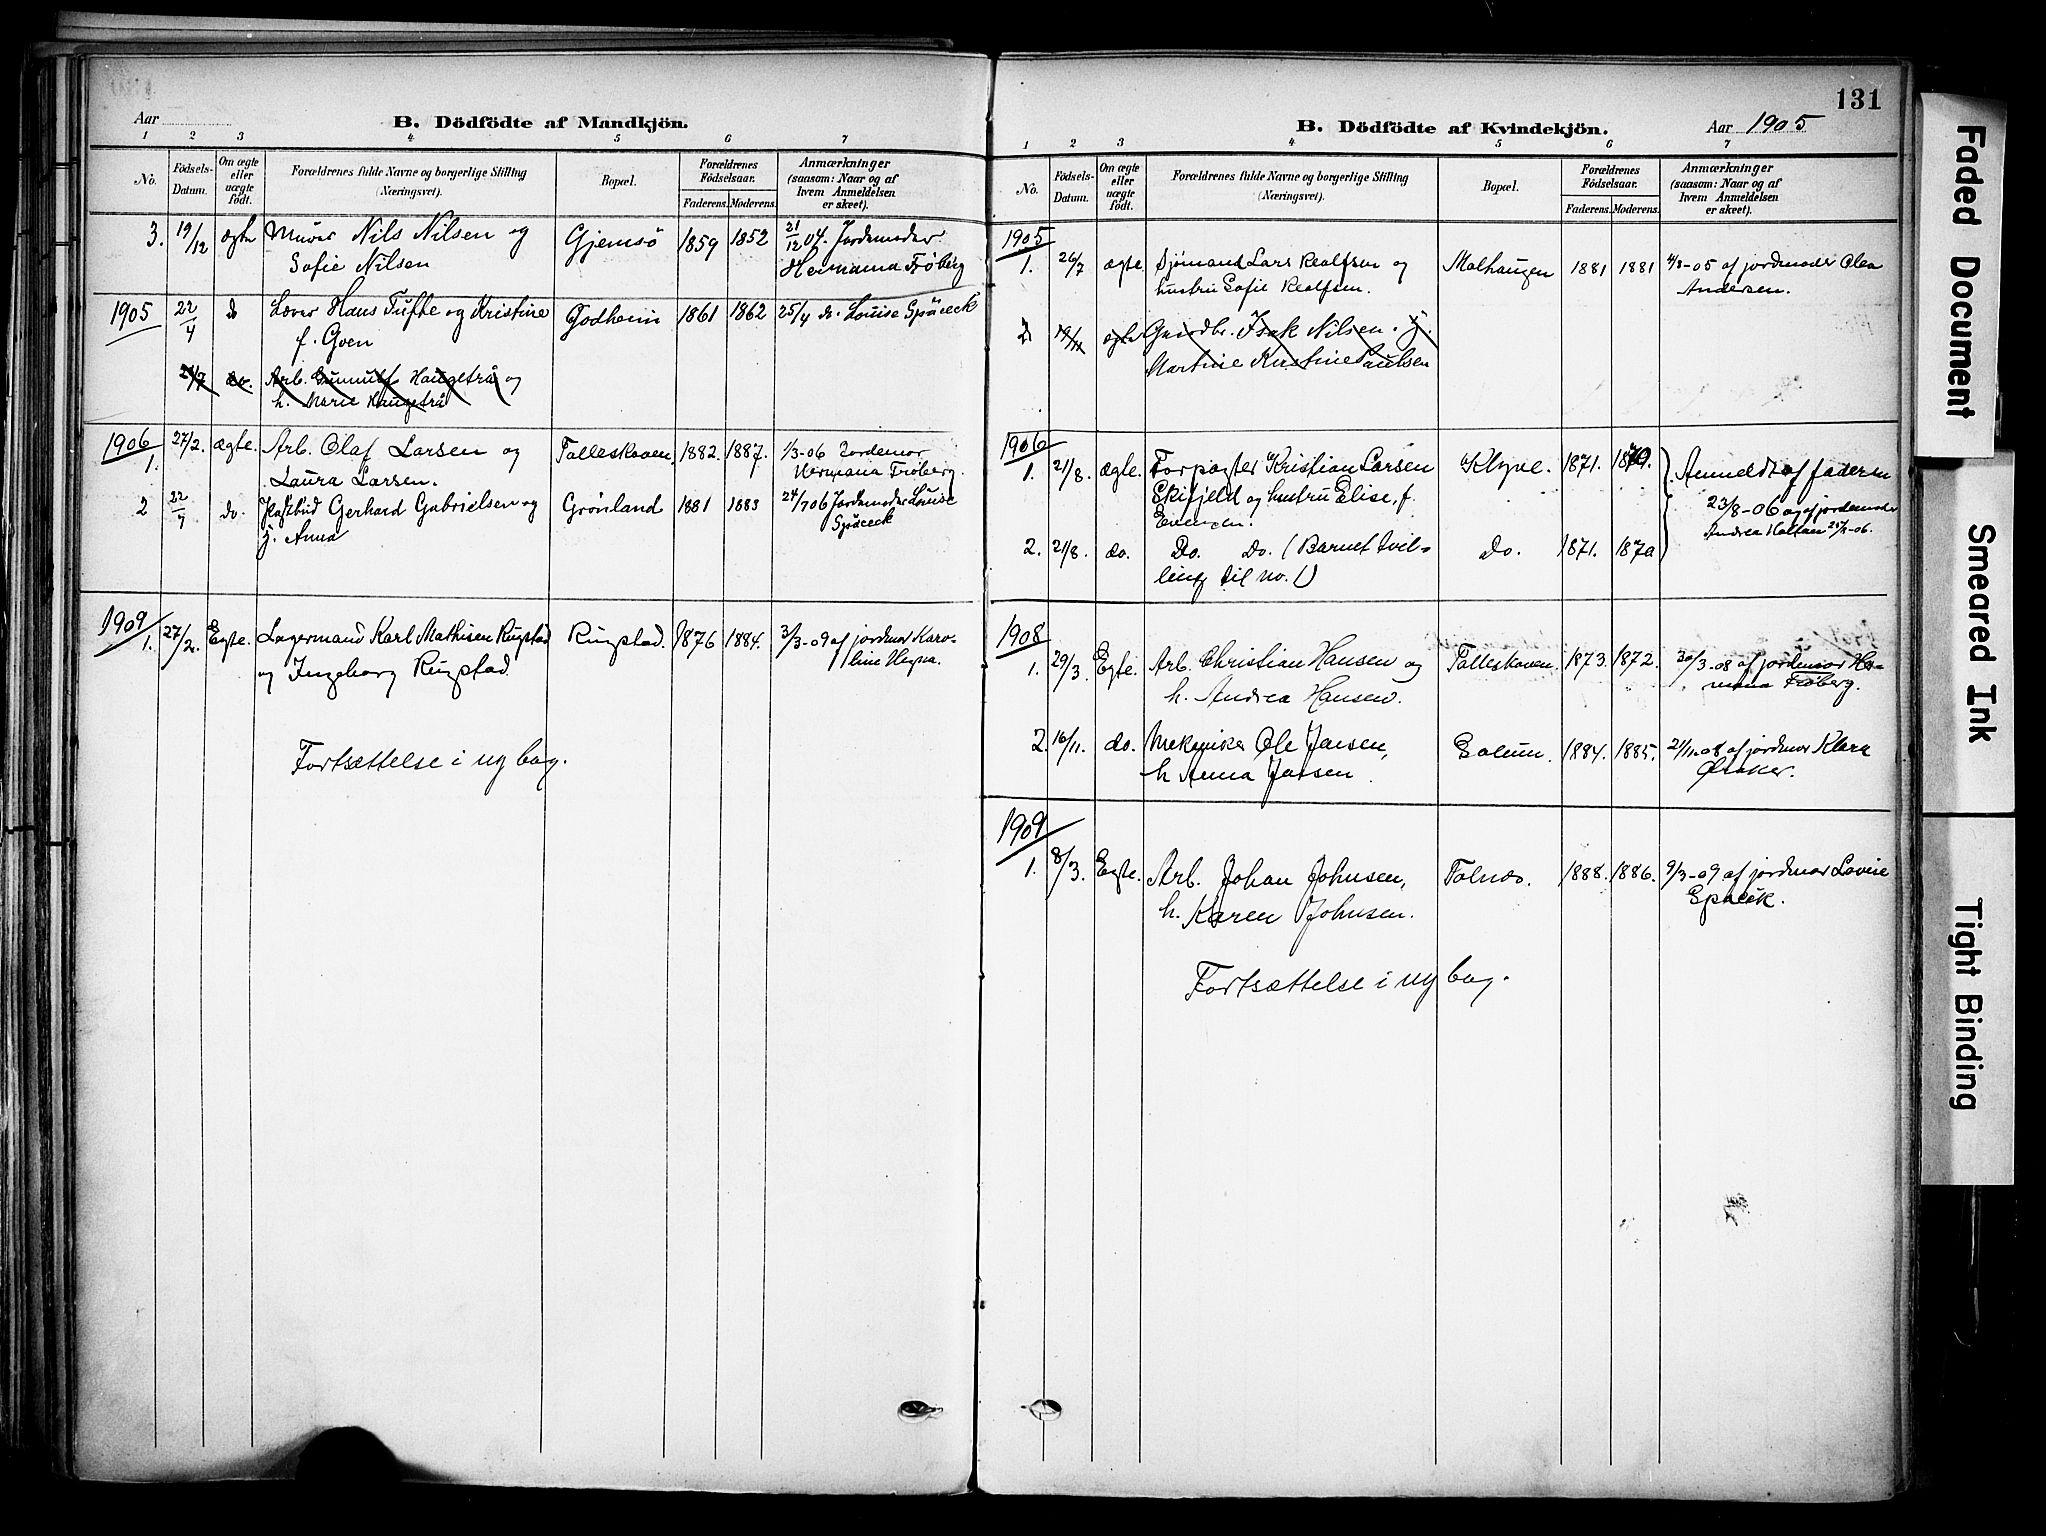 SAKO, Solum kirkebøker, F/Fa/L0011: Ministerialbok nr. I 11, 1898-1909, s. 131